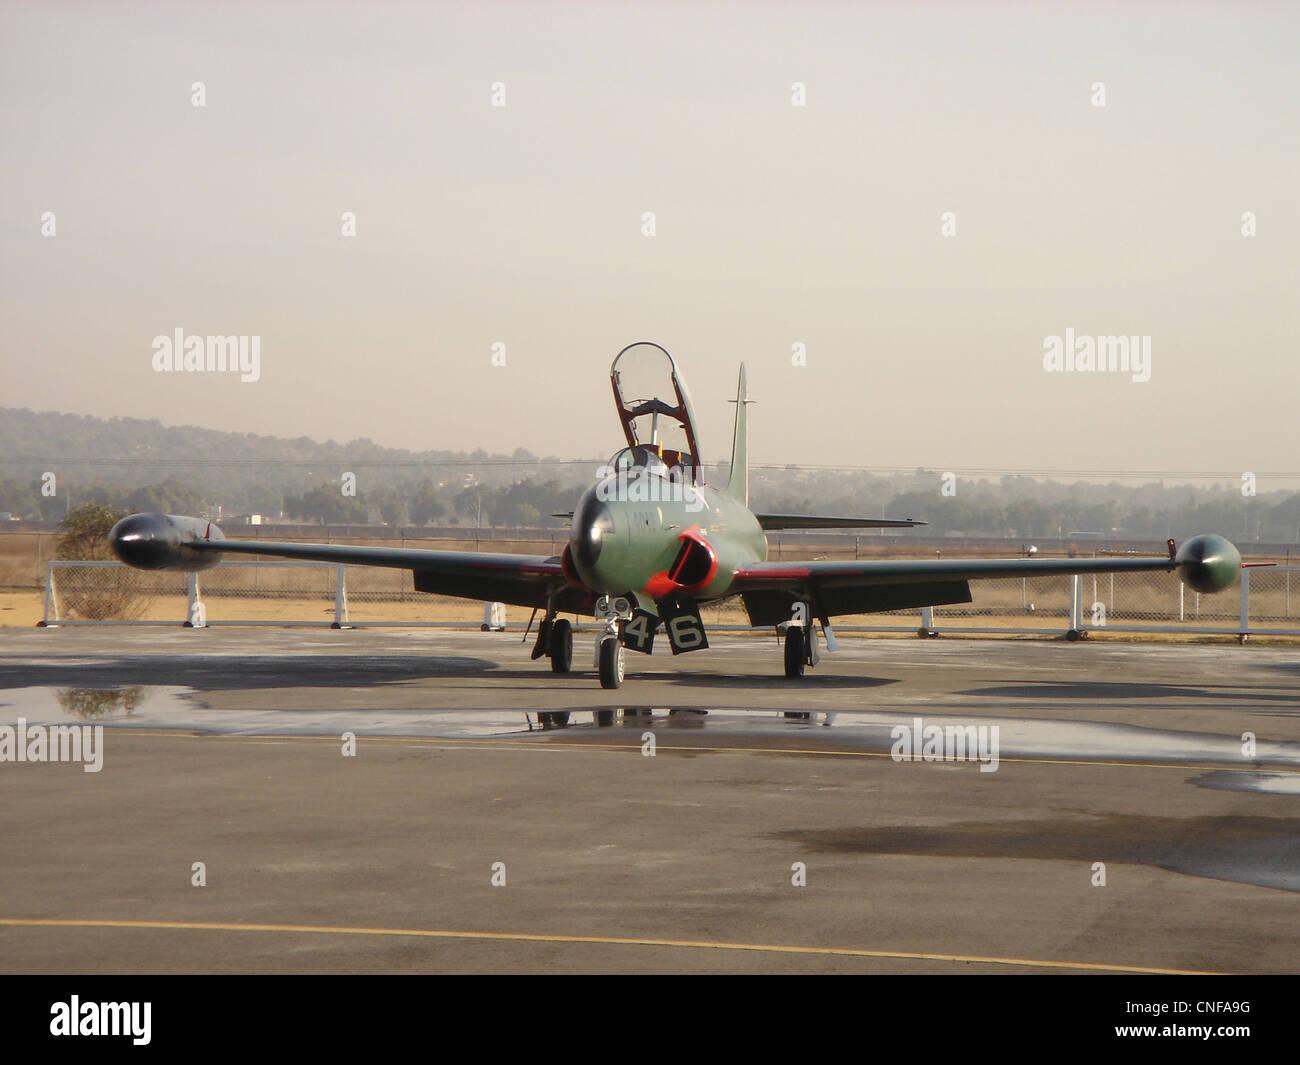 T-33 in Santa Lucia AFB. - Stock Image